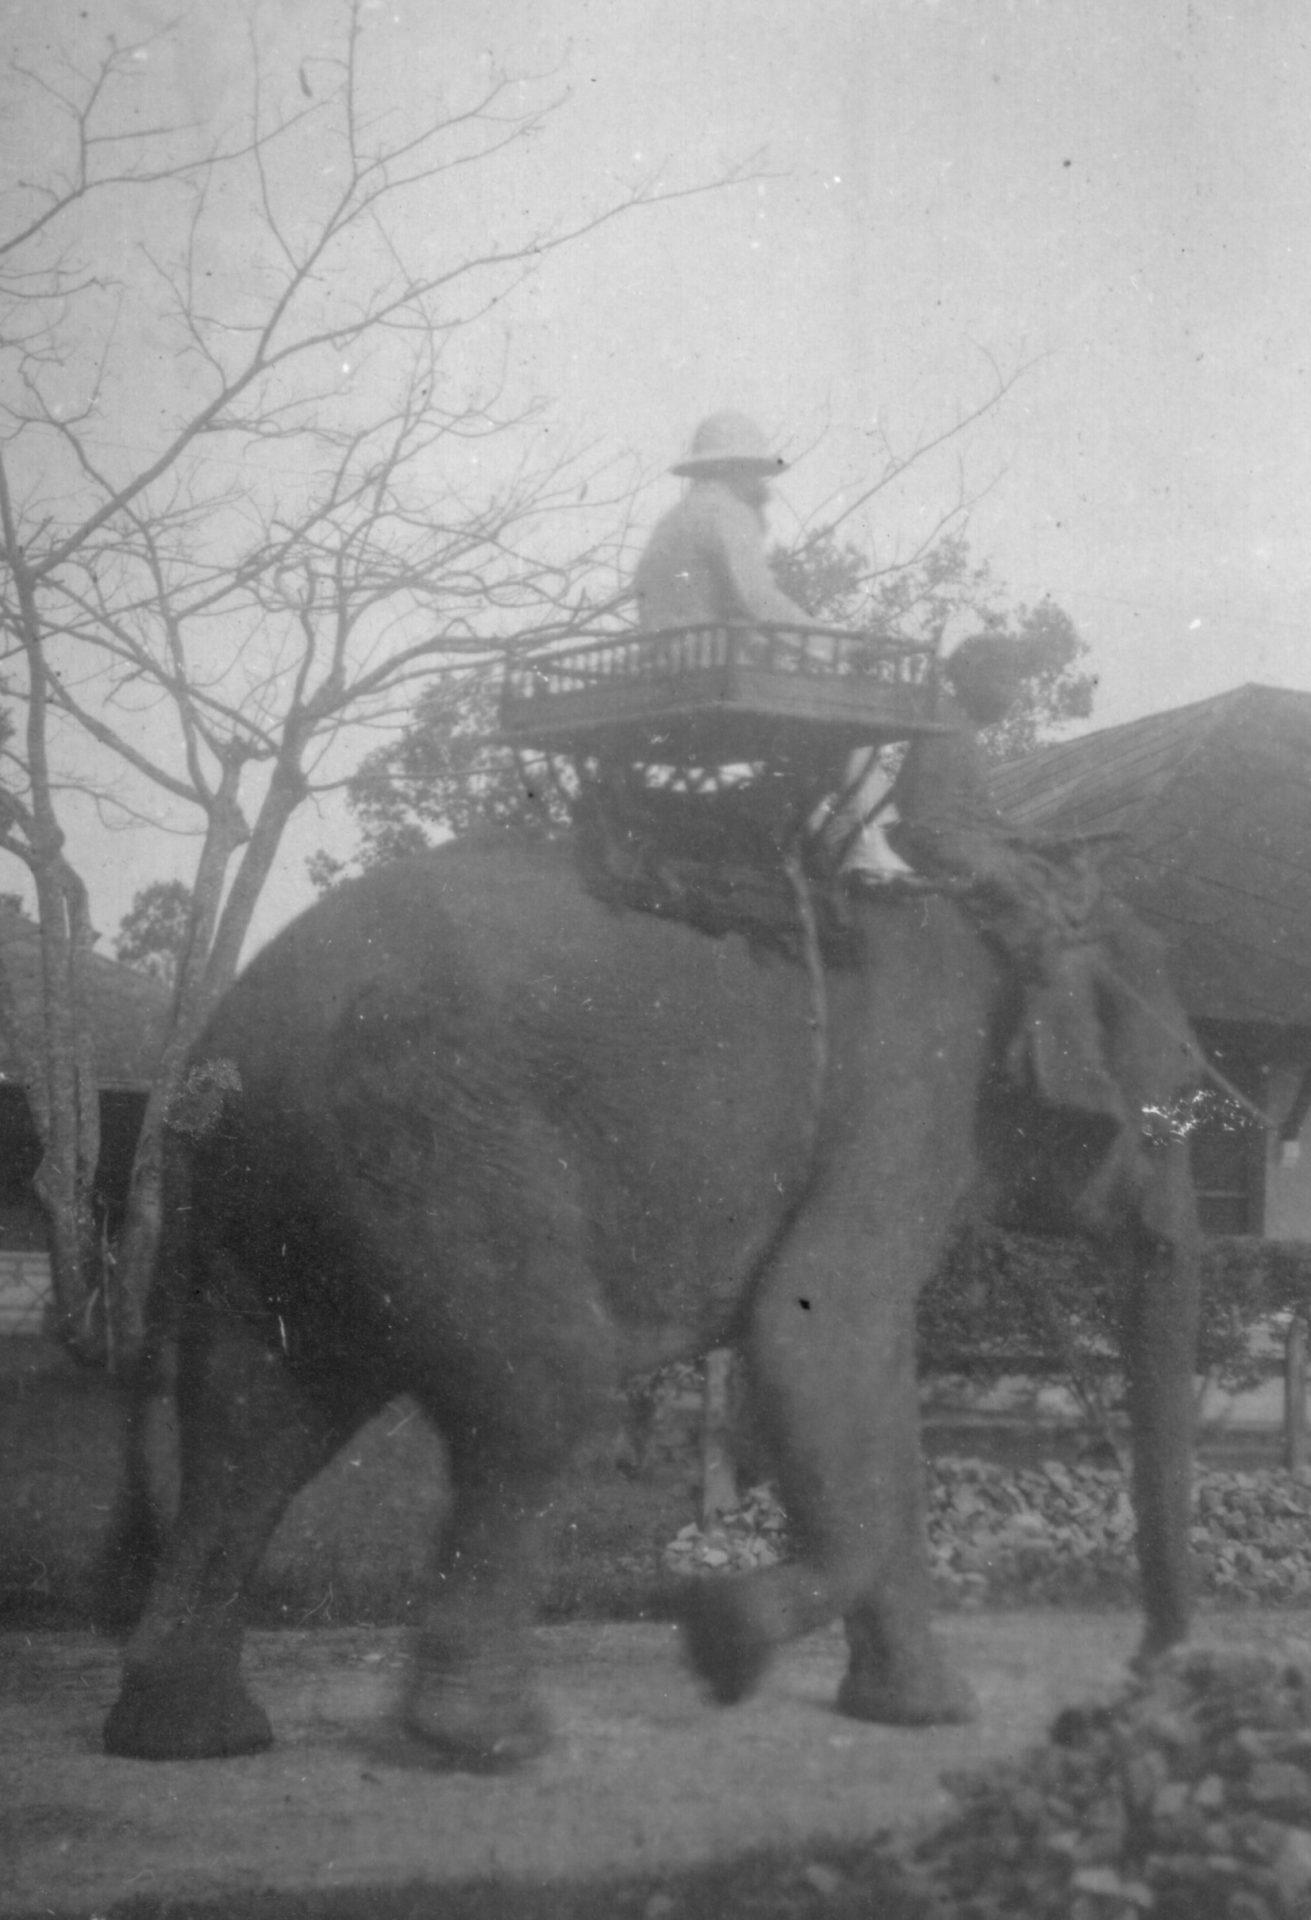 Alexandre Varenne à dos d'éléphant à Angkor - 1926